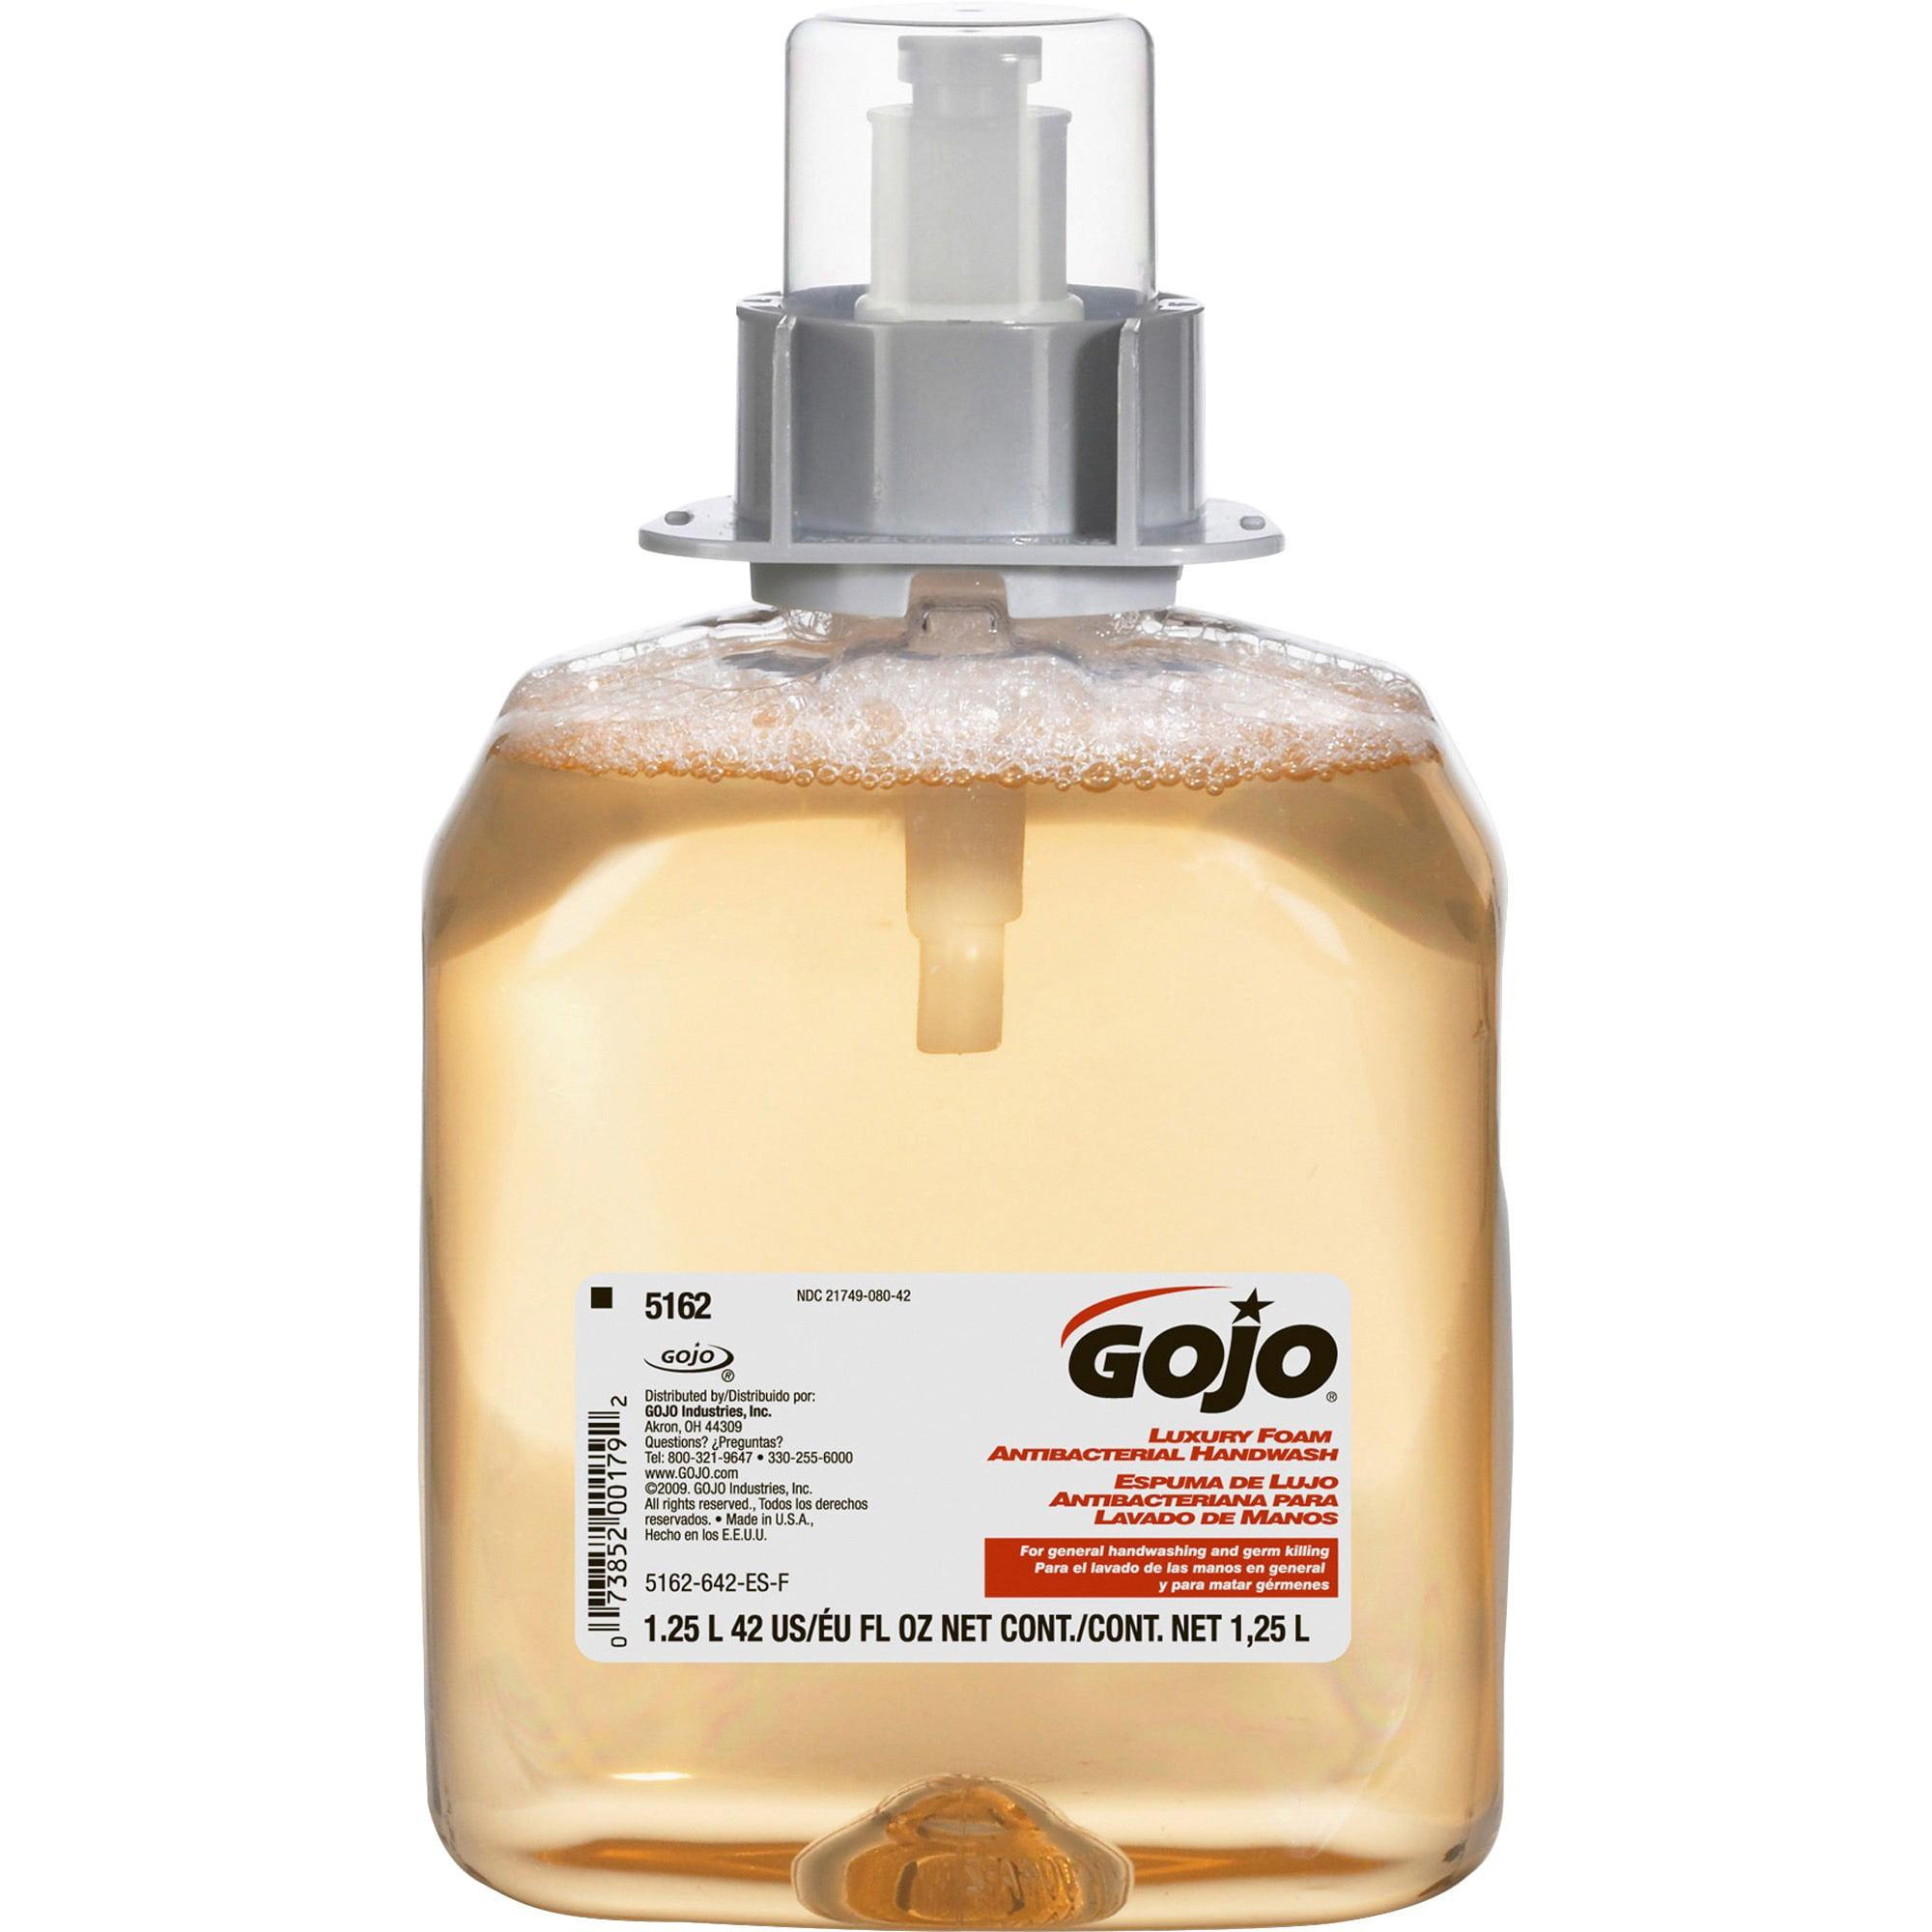 GOJO 1250 ml Refill Orange Blossom Scented Antibacterial Luxuury Foam Handwash Chloroxylenol Liquid